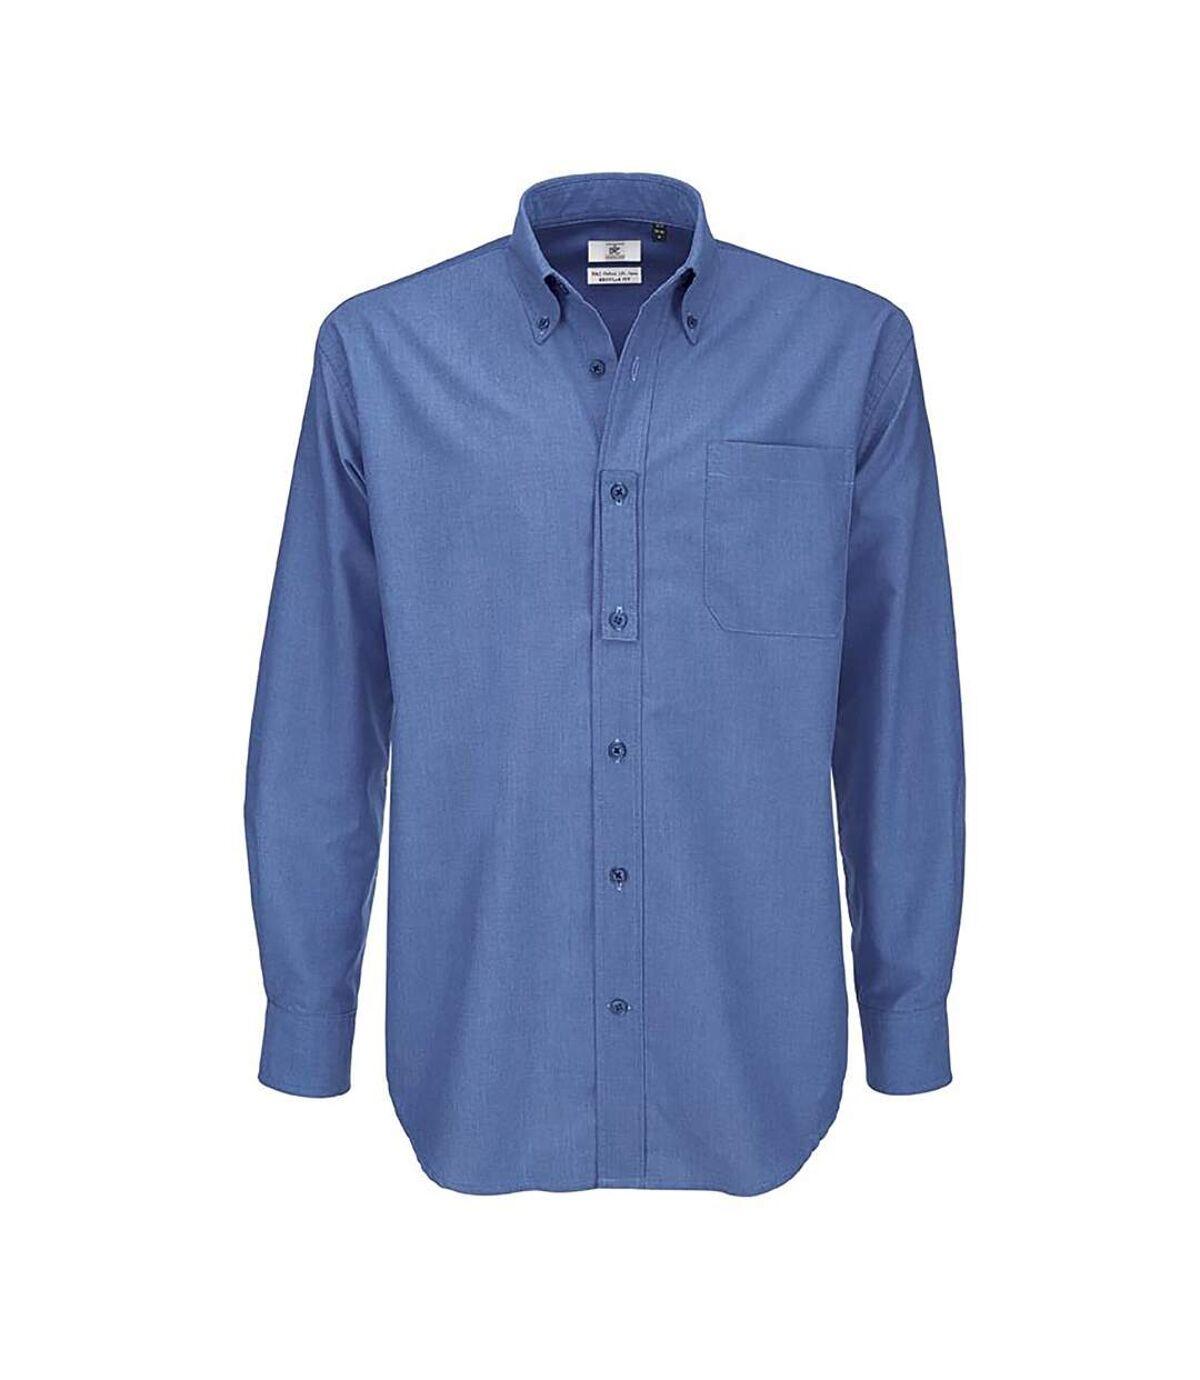 B&C Mens Oxford Long Sleeve Shirt / Mens Shirts (Blue Chip) - UTBC105